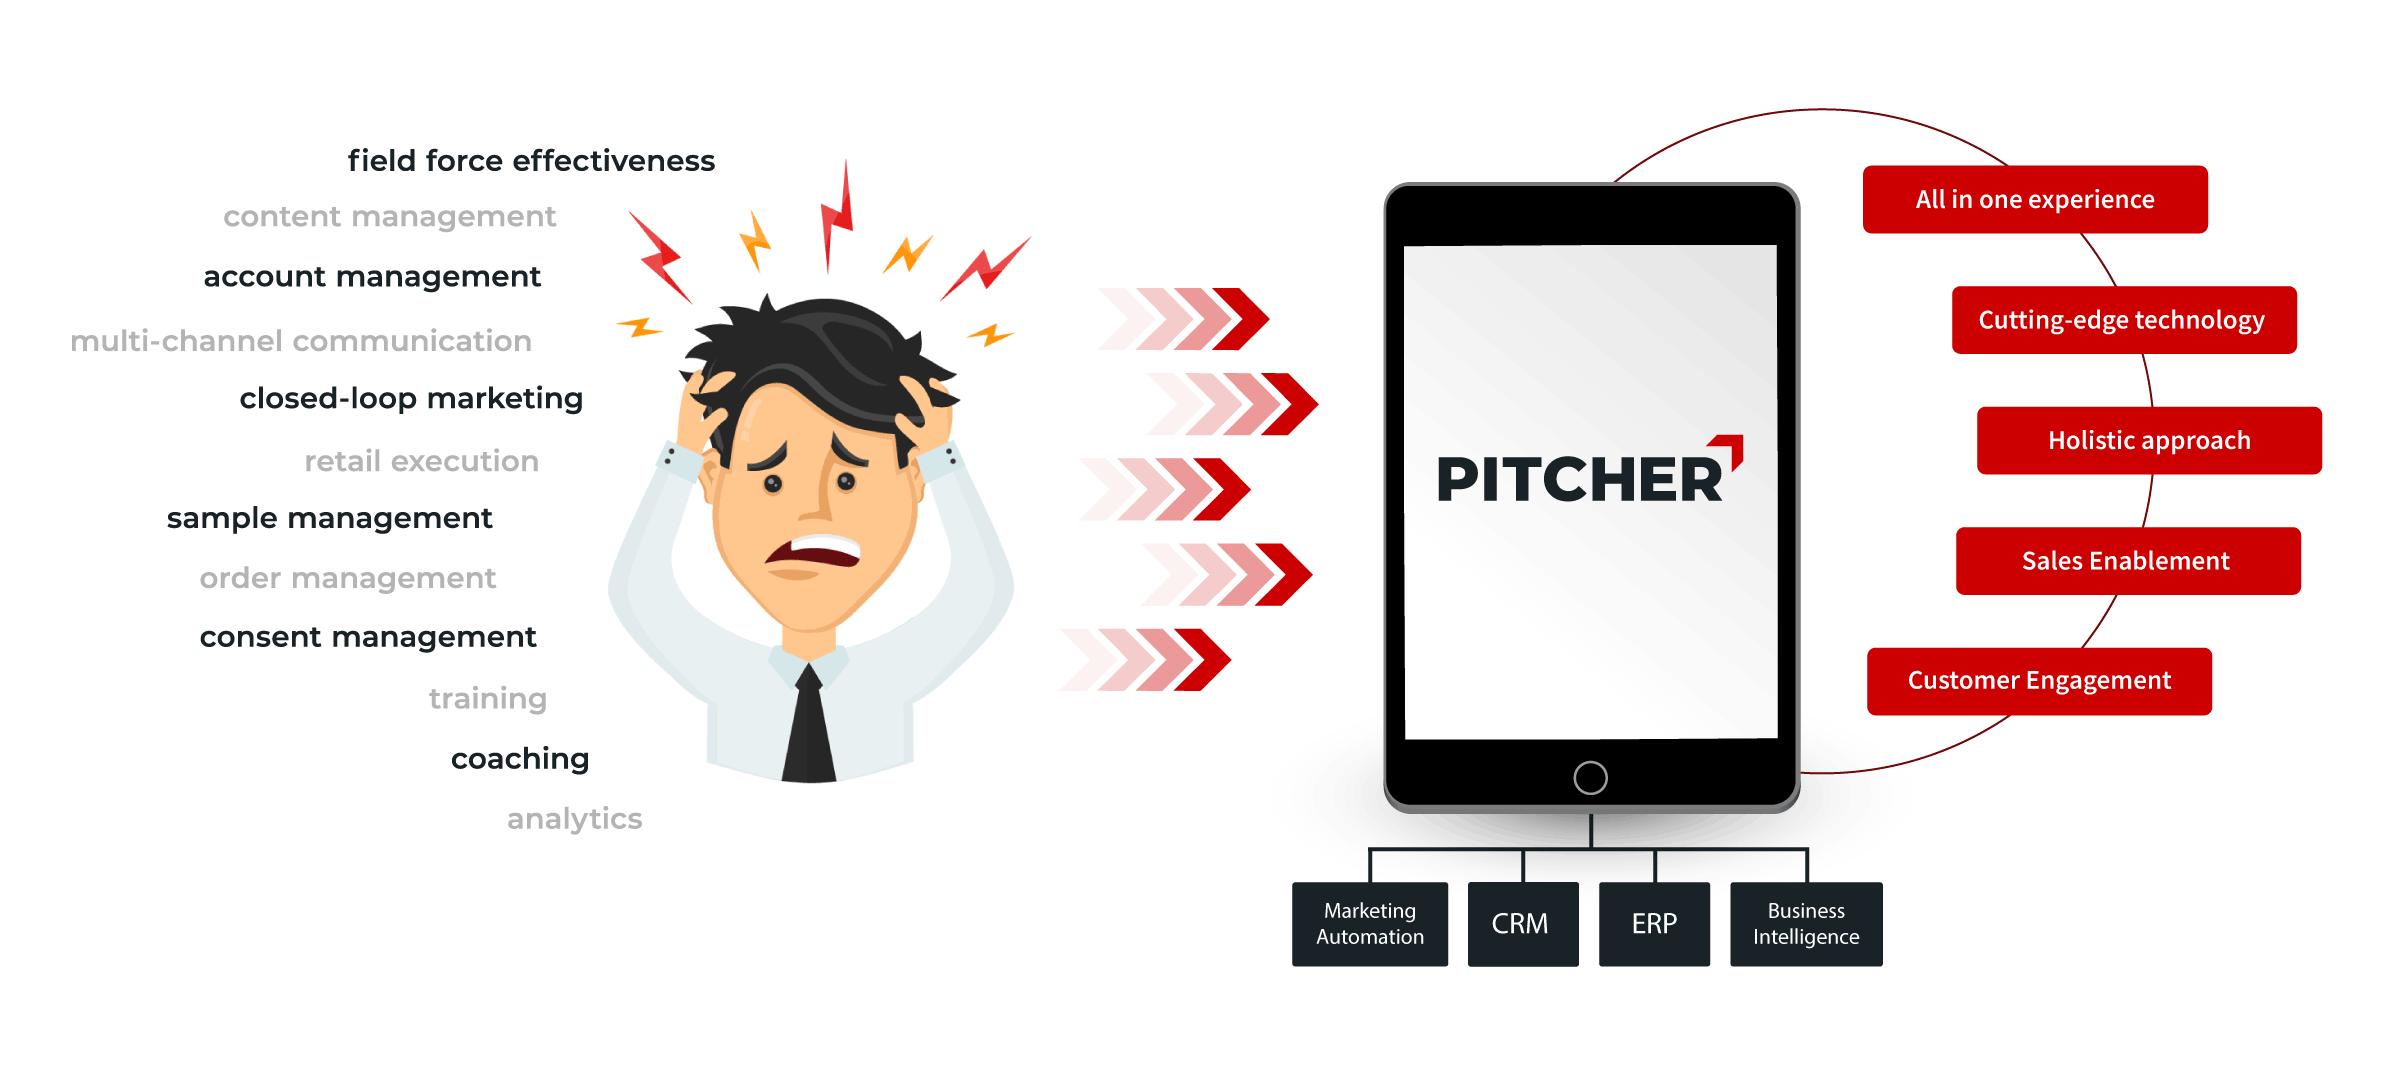 210428_Pitcher_SuperApp_Graphic_Crazy_Sales_Guy_02-1